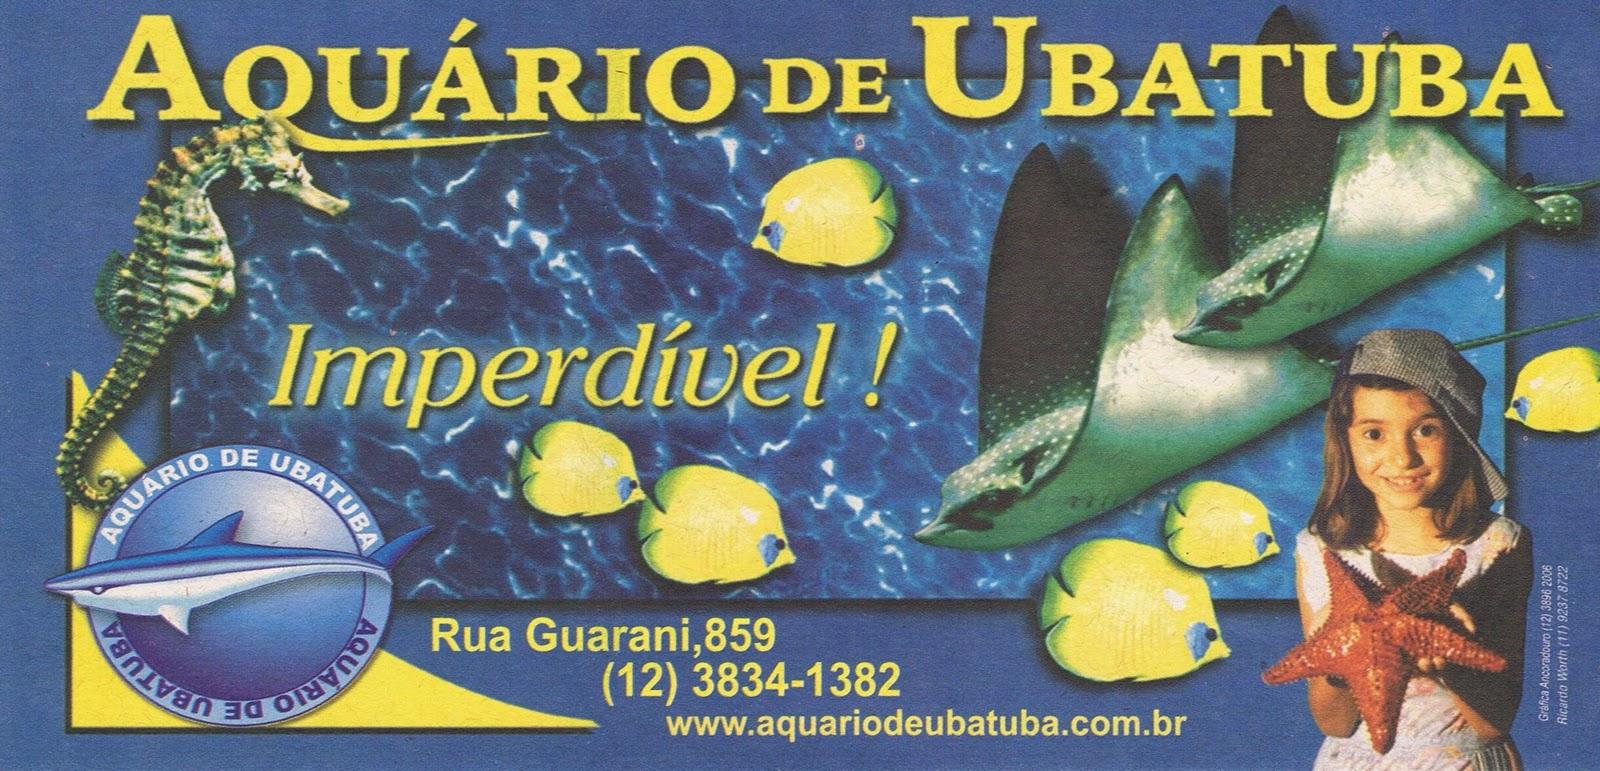 UBATUBA MAGICA: AQUaRIO DE UBATUBA